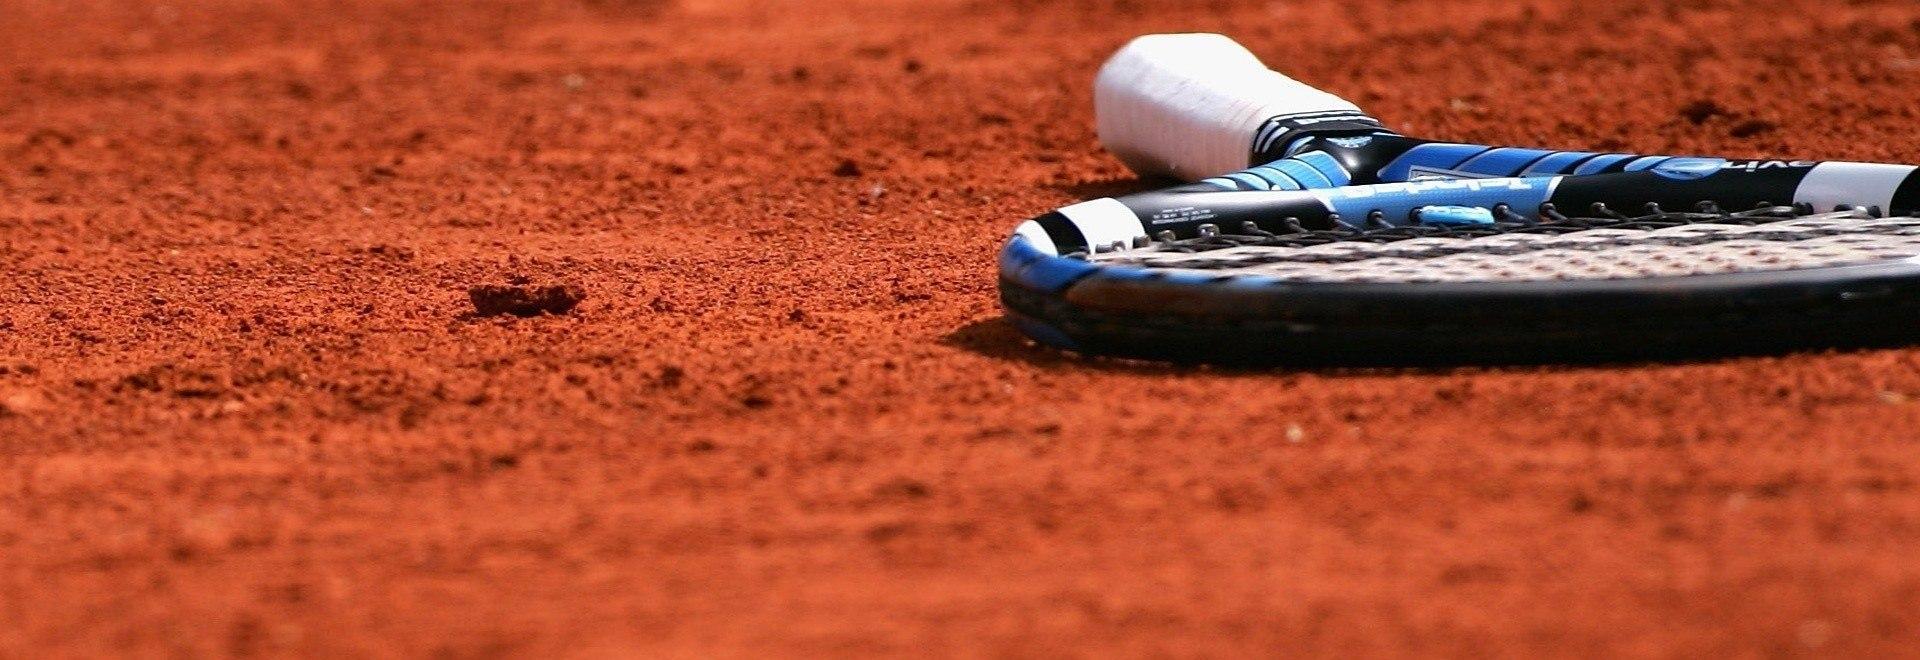 ATP World Tour Masters 1000 HL 2016 - Stag. 2016 - Toronto